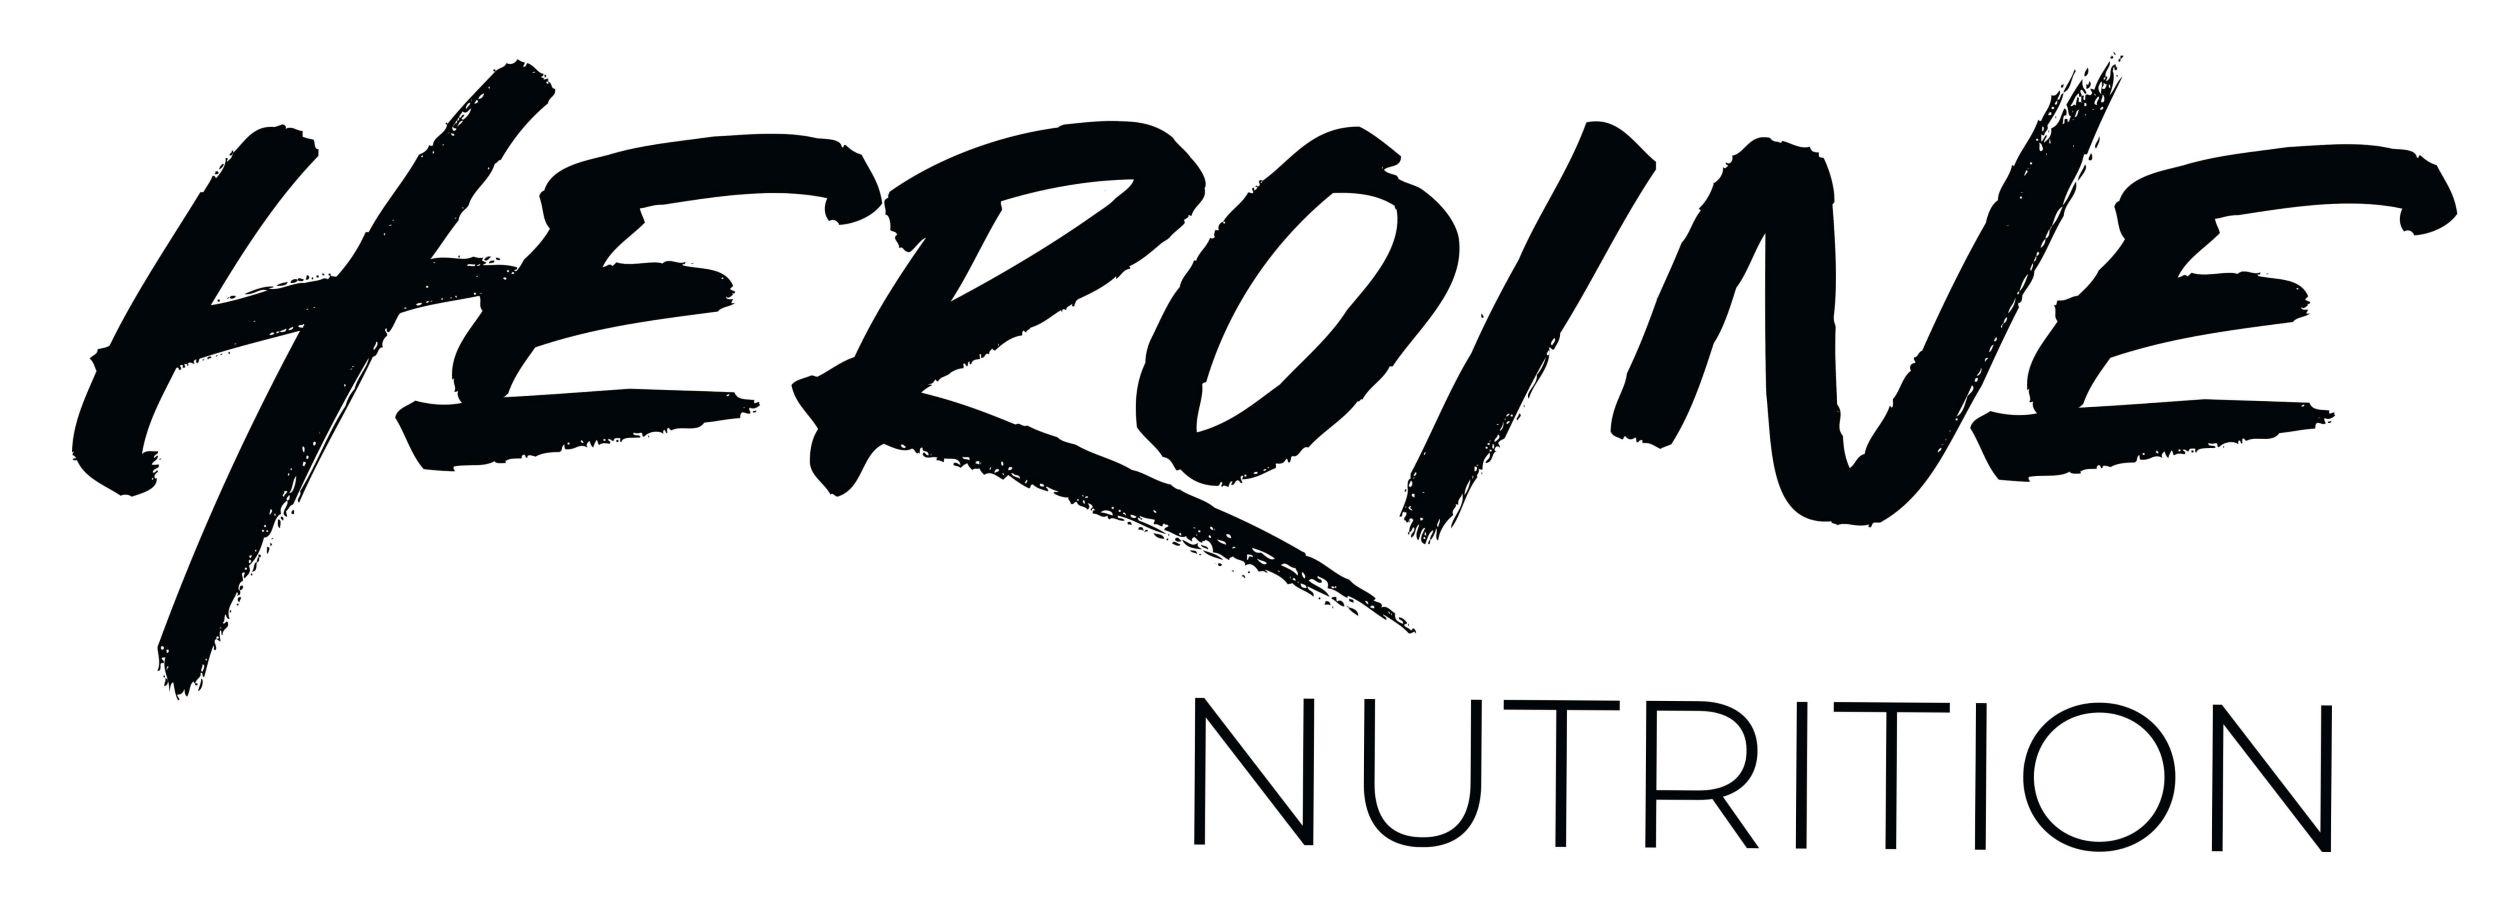 Heroine Nutrition